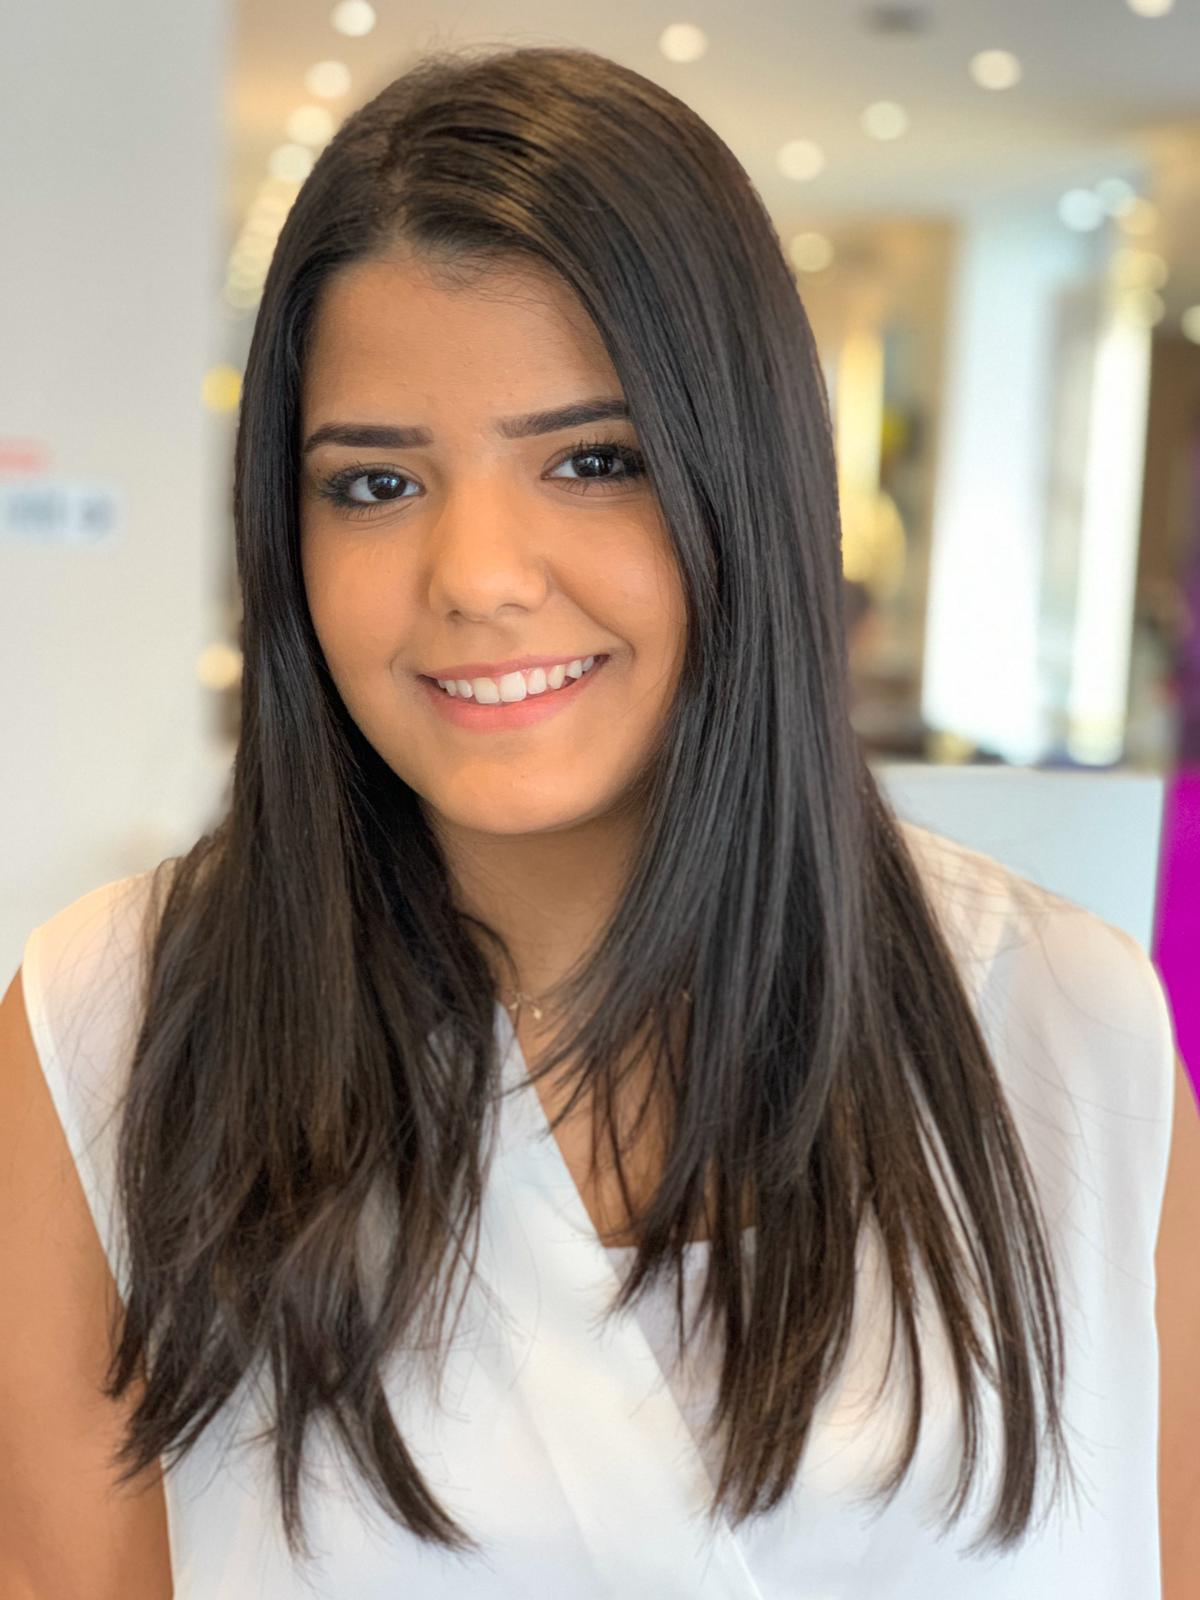 Irem - Beautylounge Vienna Assistentin